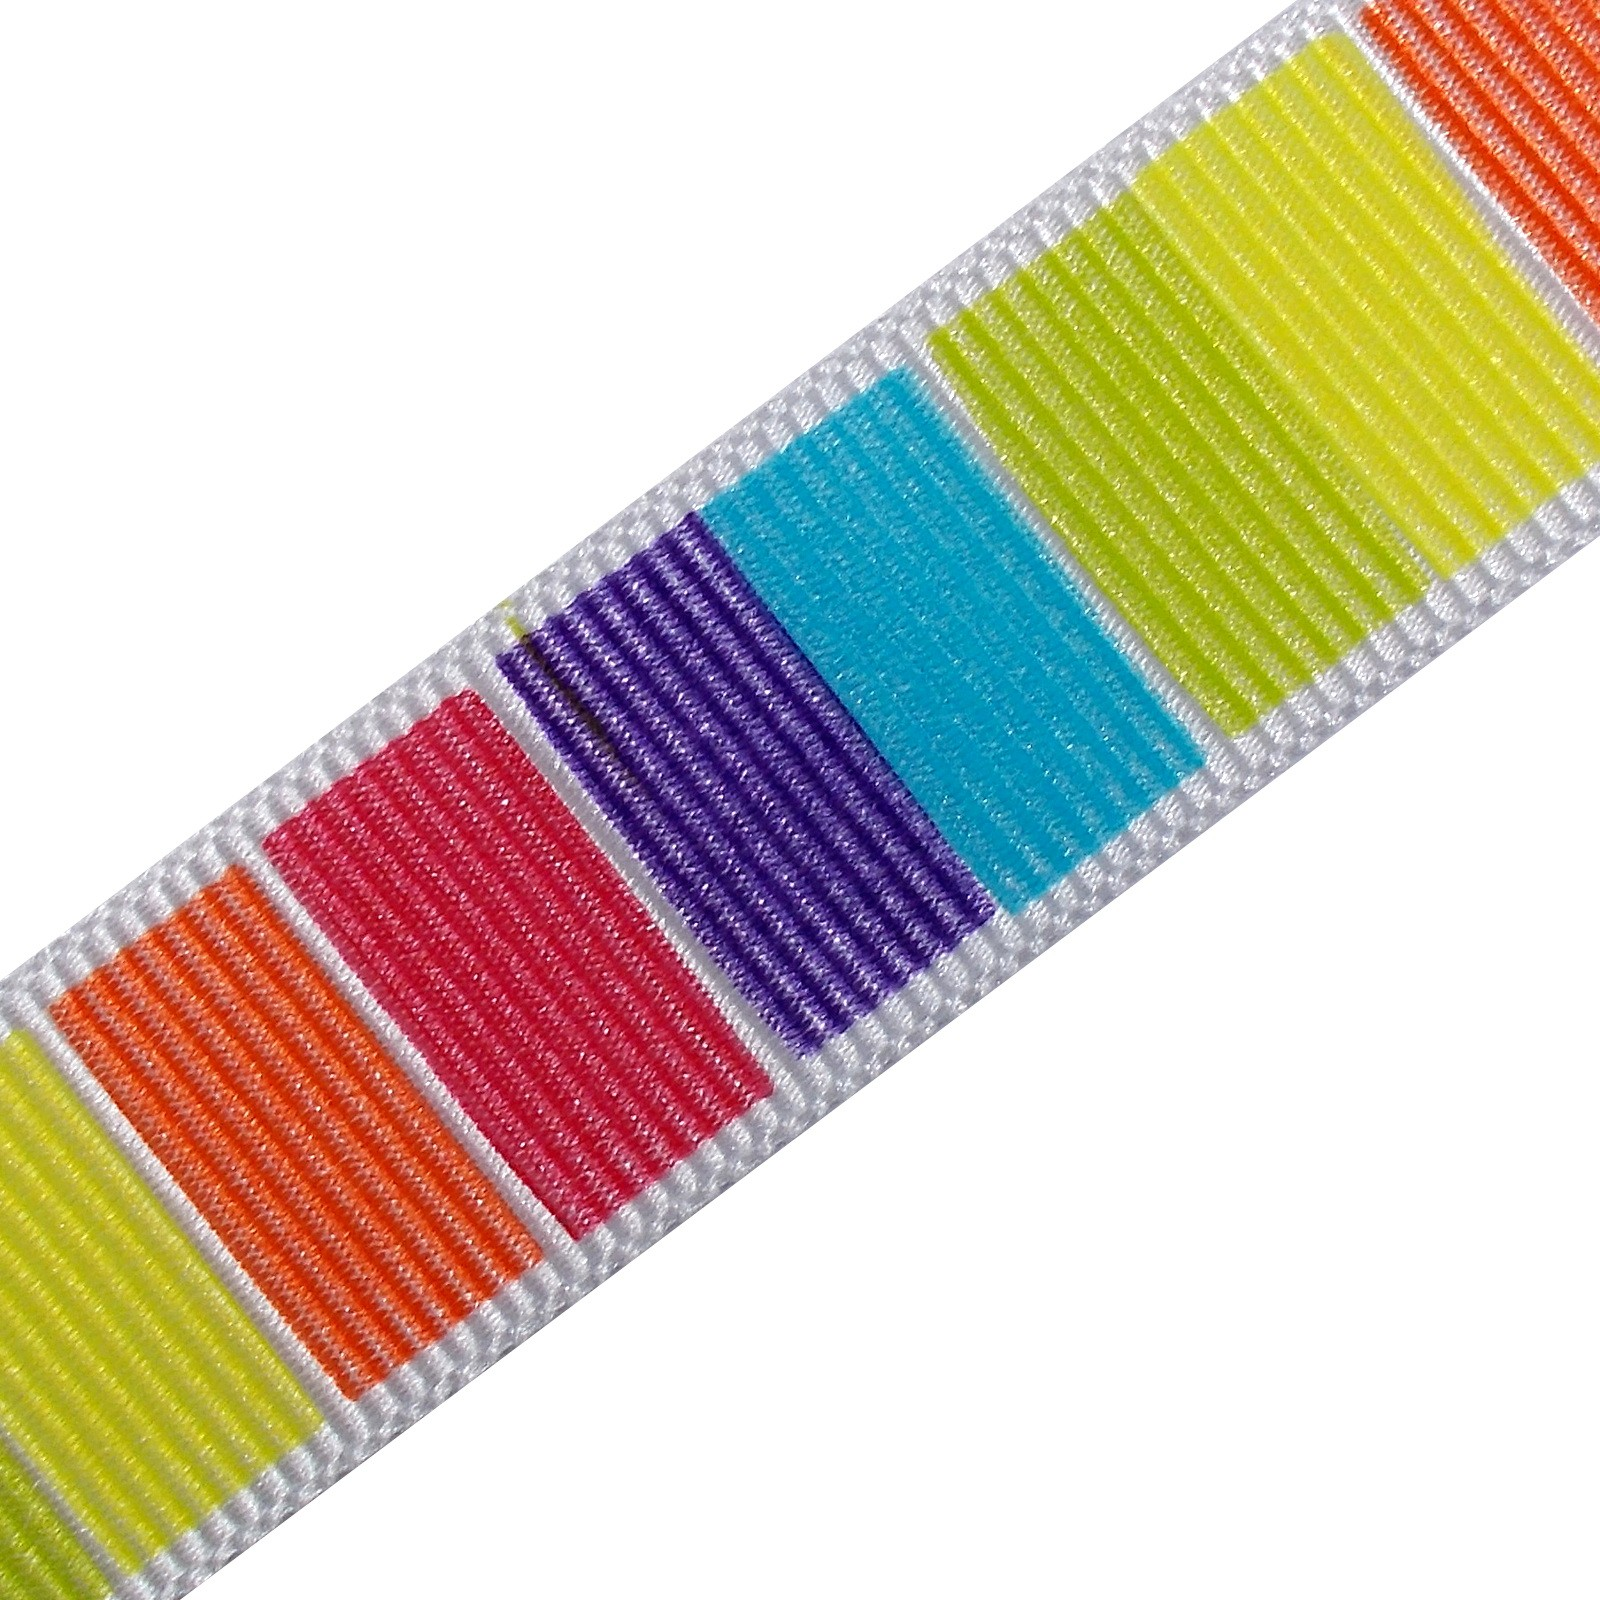 Berisfords Bright Rainbow Grosgrain Ribbon 16mm wide Block Stripes 2 metre length